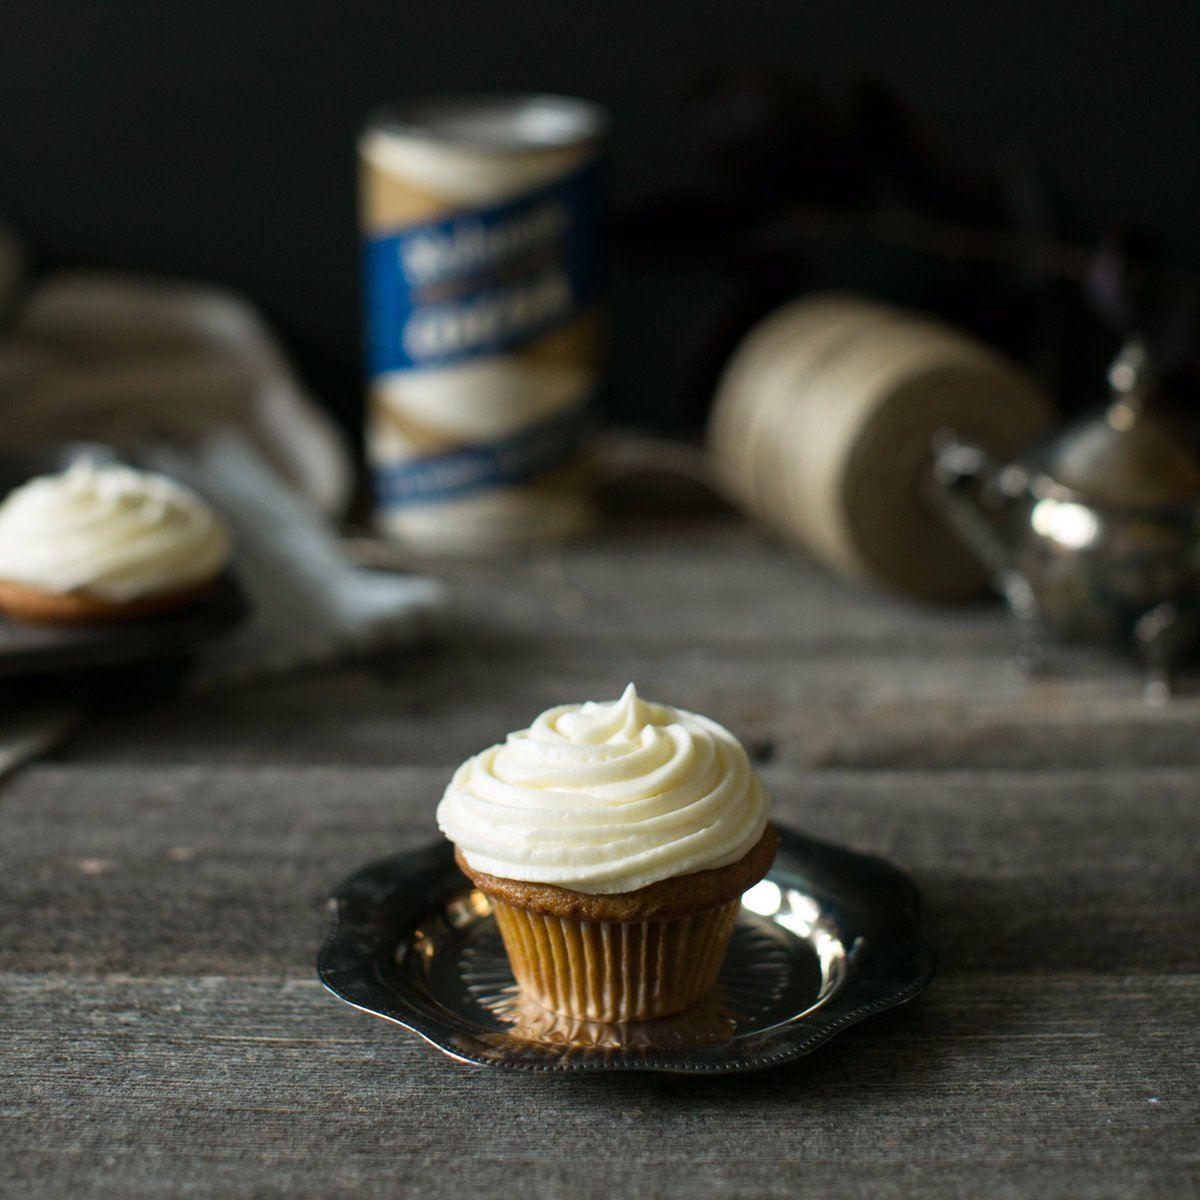 Crave Cookies & Cupcakes